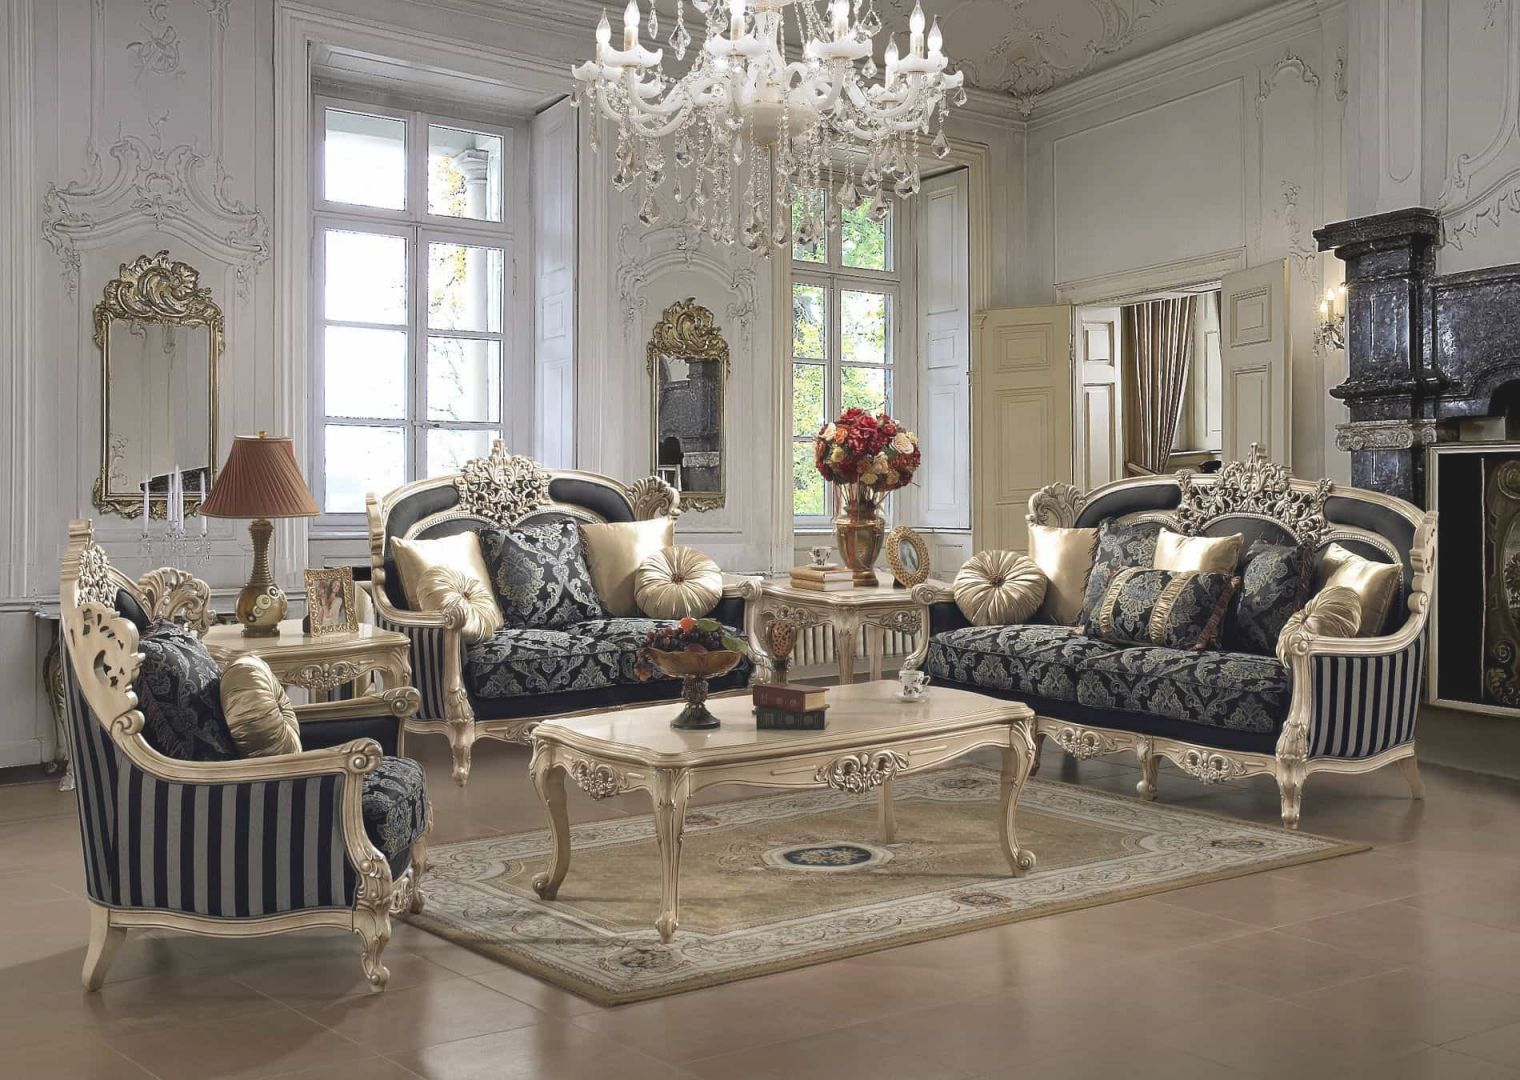 Choosing Tips For Elegant Living Room Furniture | Wearefound intended for Unique Victorian Living Room Furniture